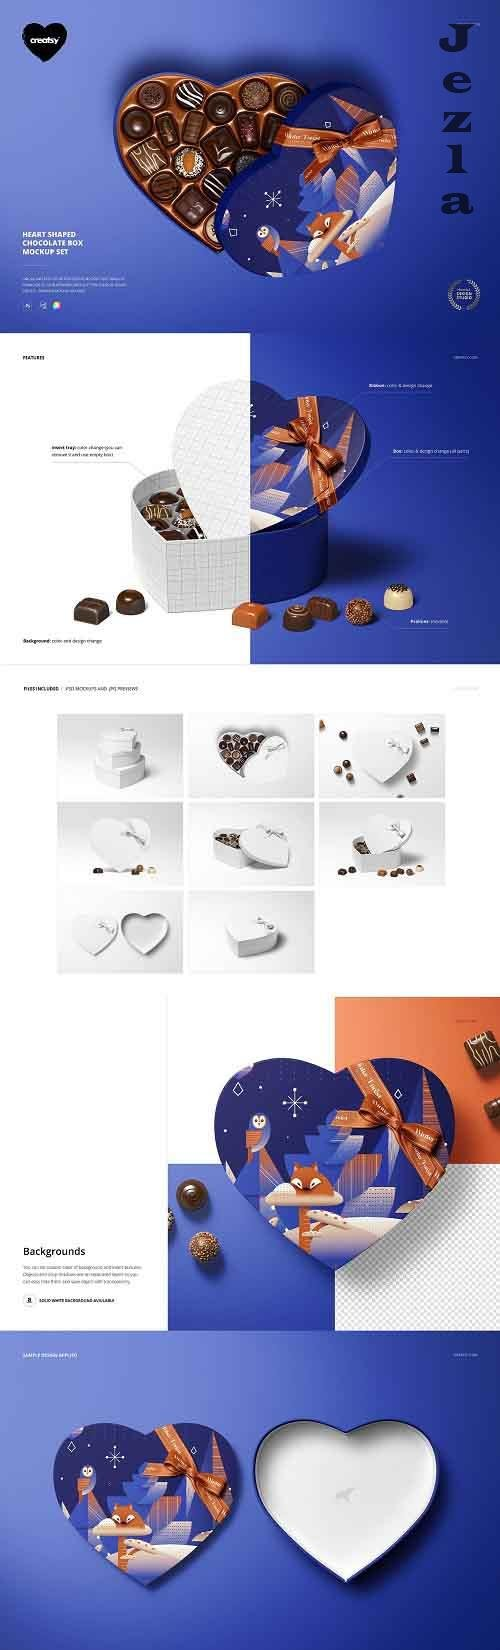 CreativeMarket - Heart Shaped Chocolate Box Mockup 5851006